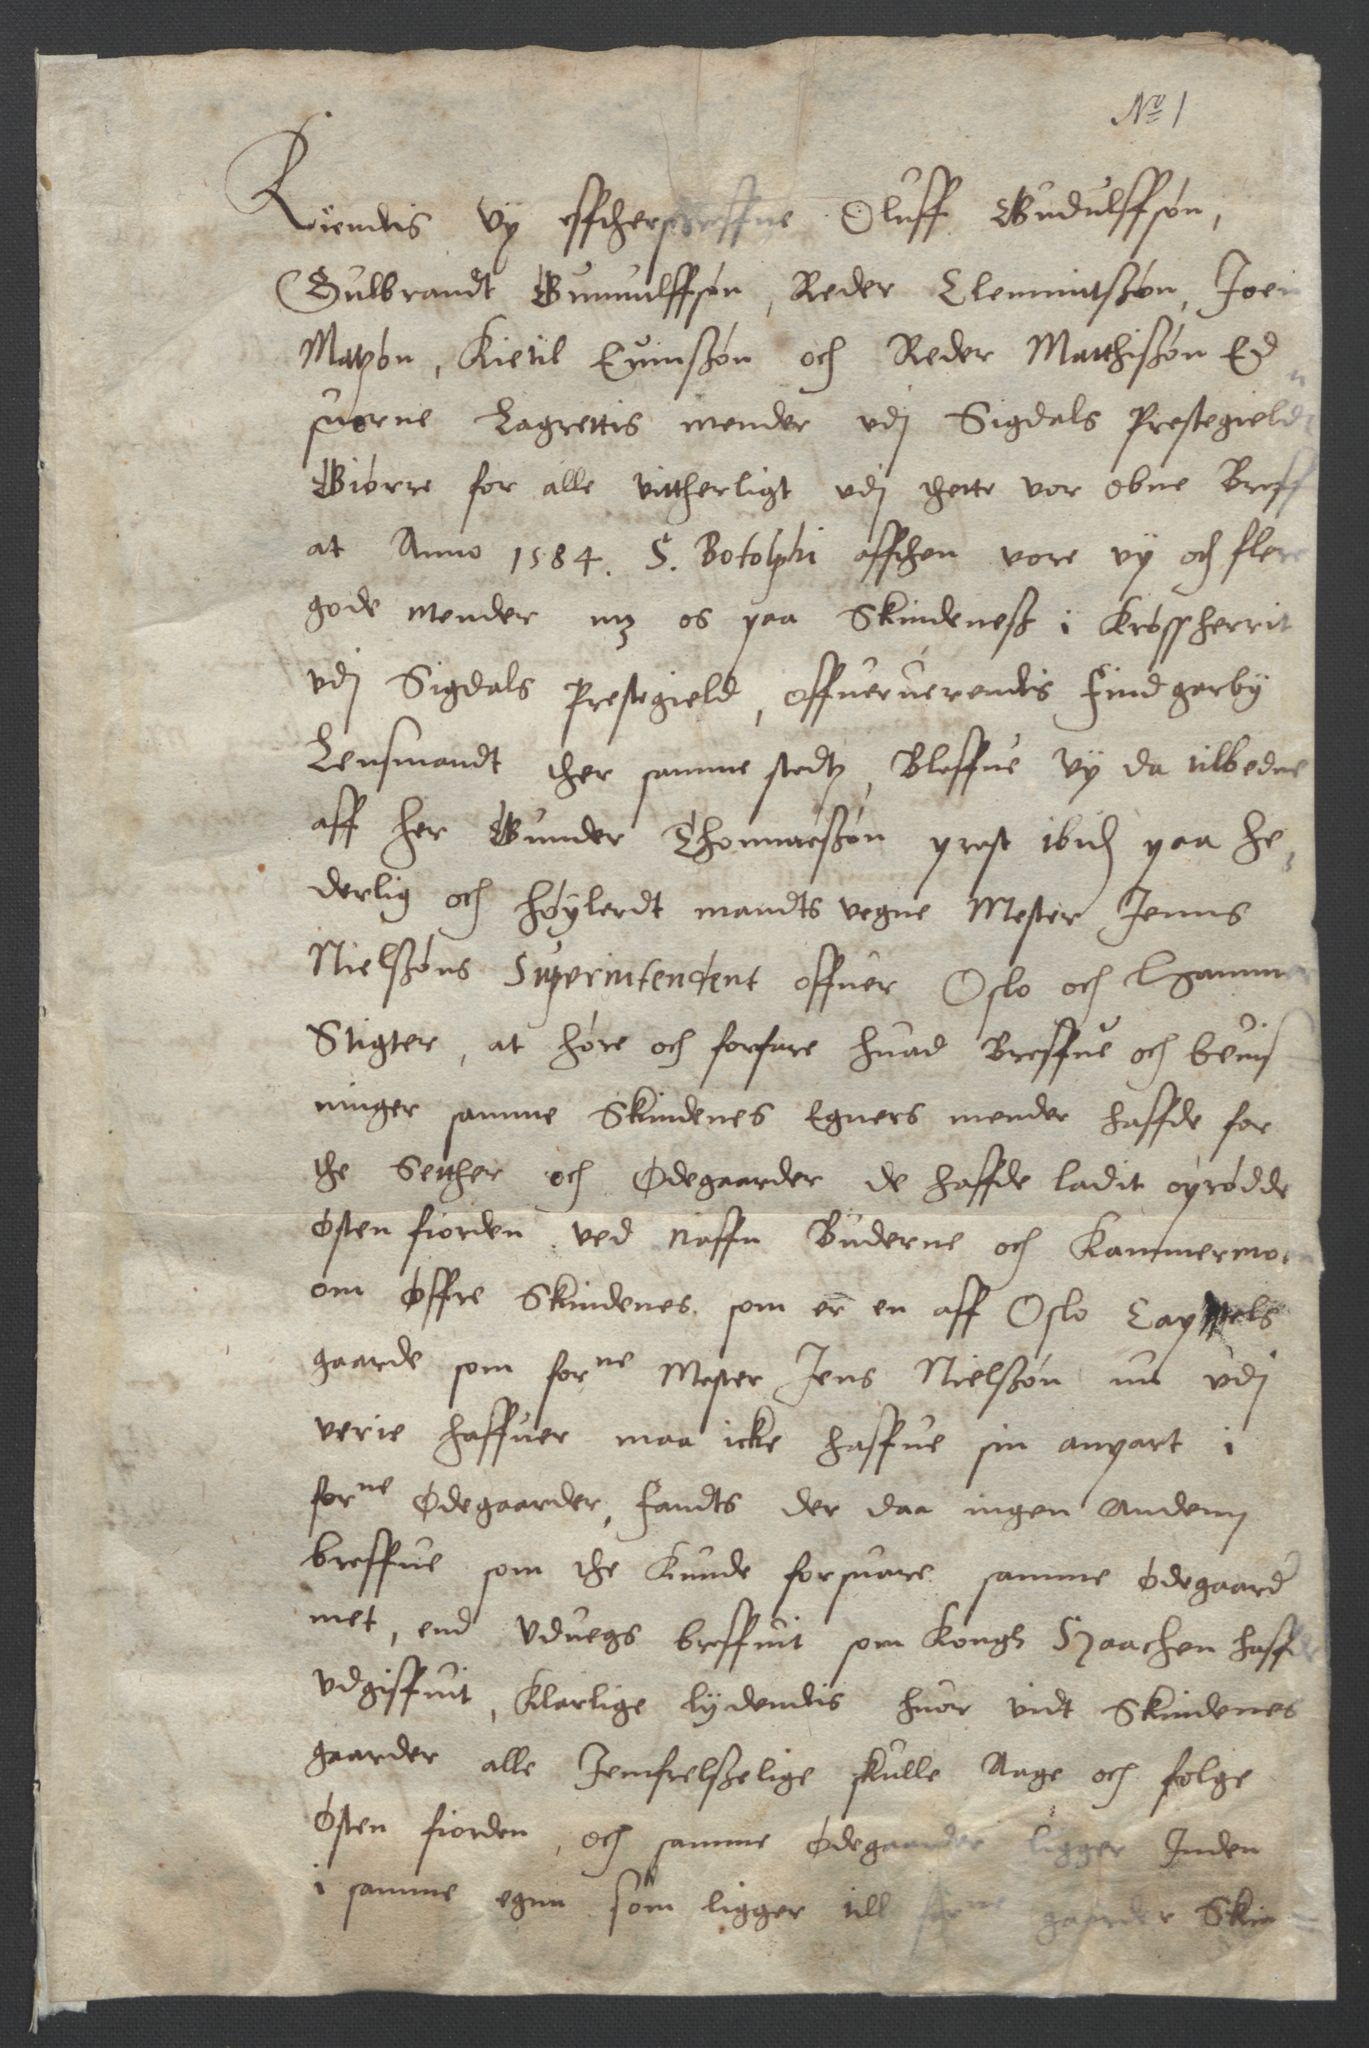 SAO, Oslo stiftsdireksjon, G/Gb/L0001: Bispestolens dokumenter, 1584-1612, s. 1